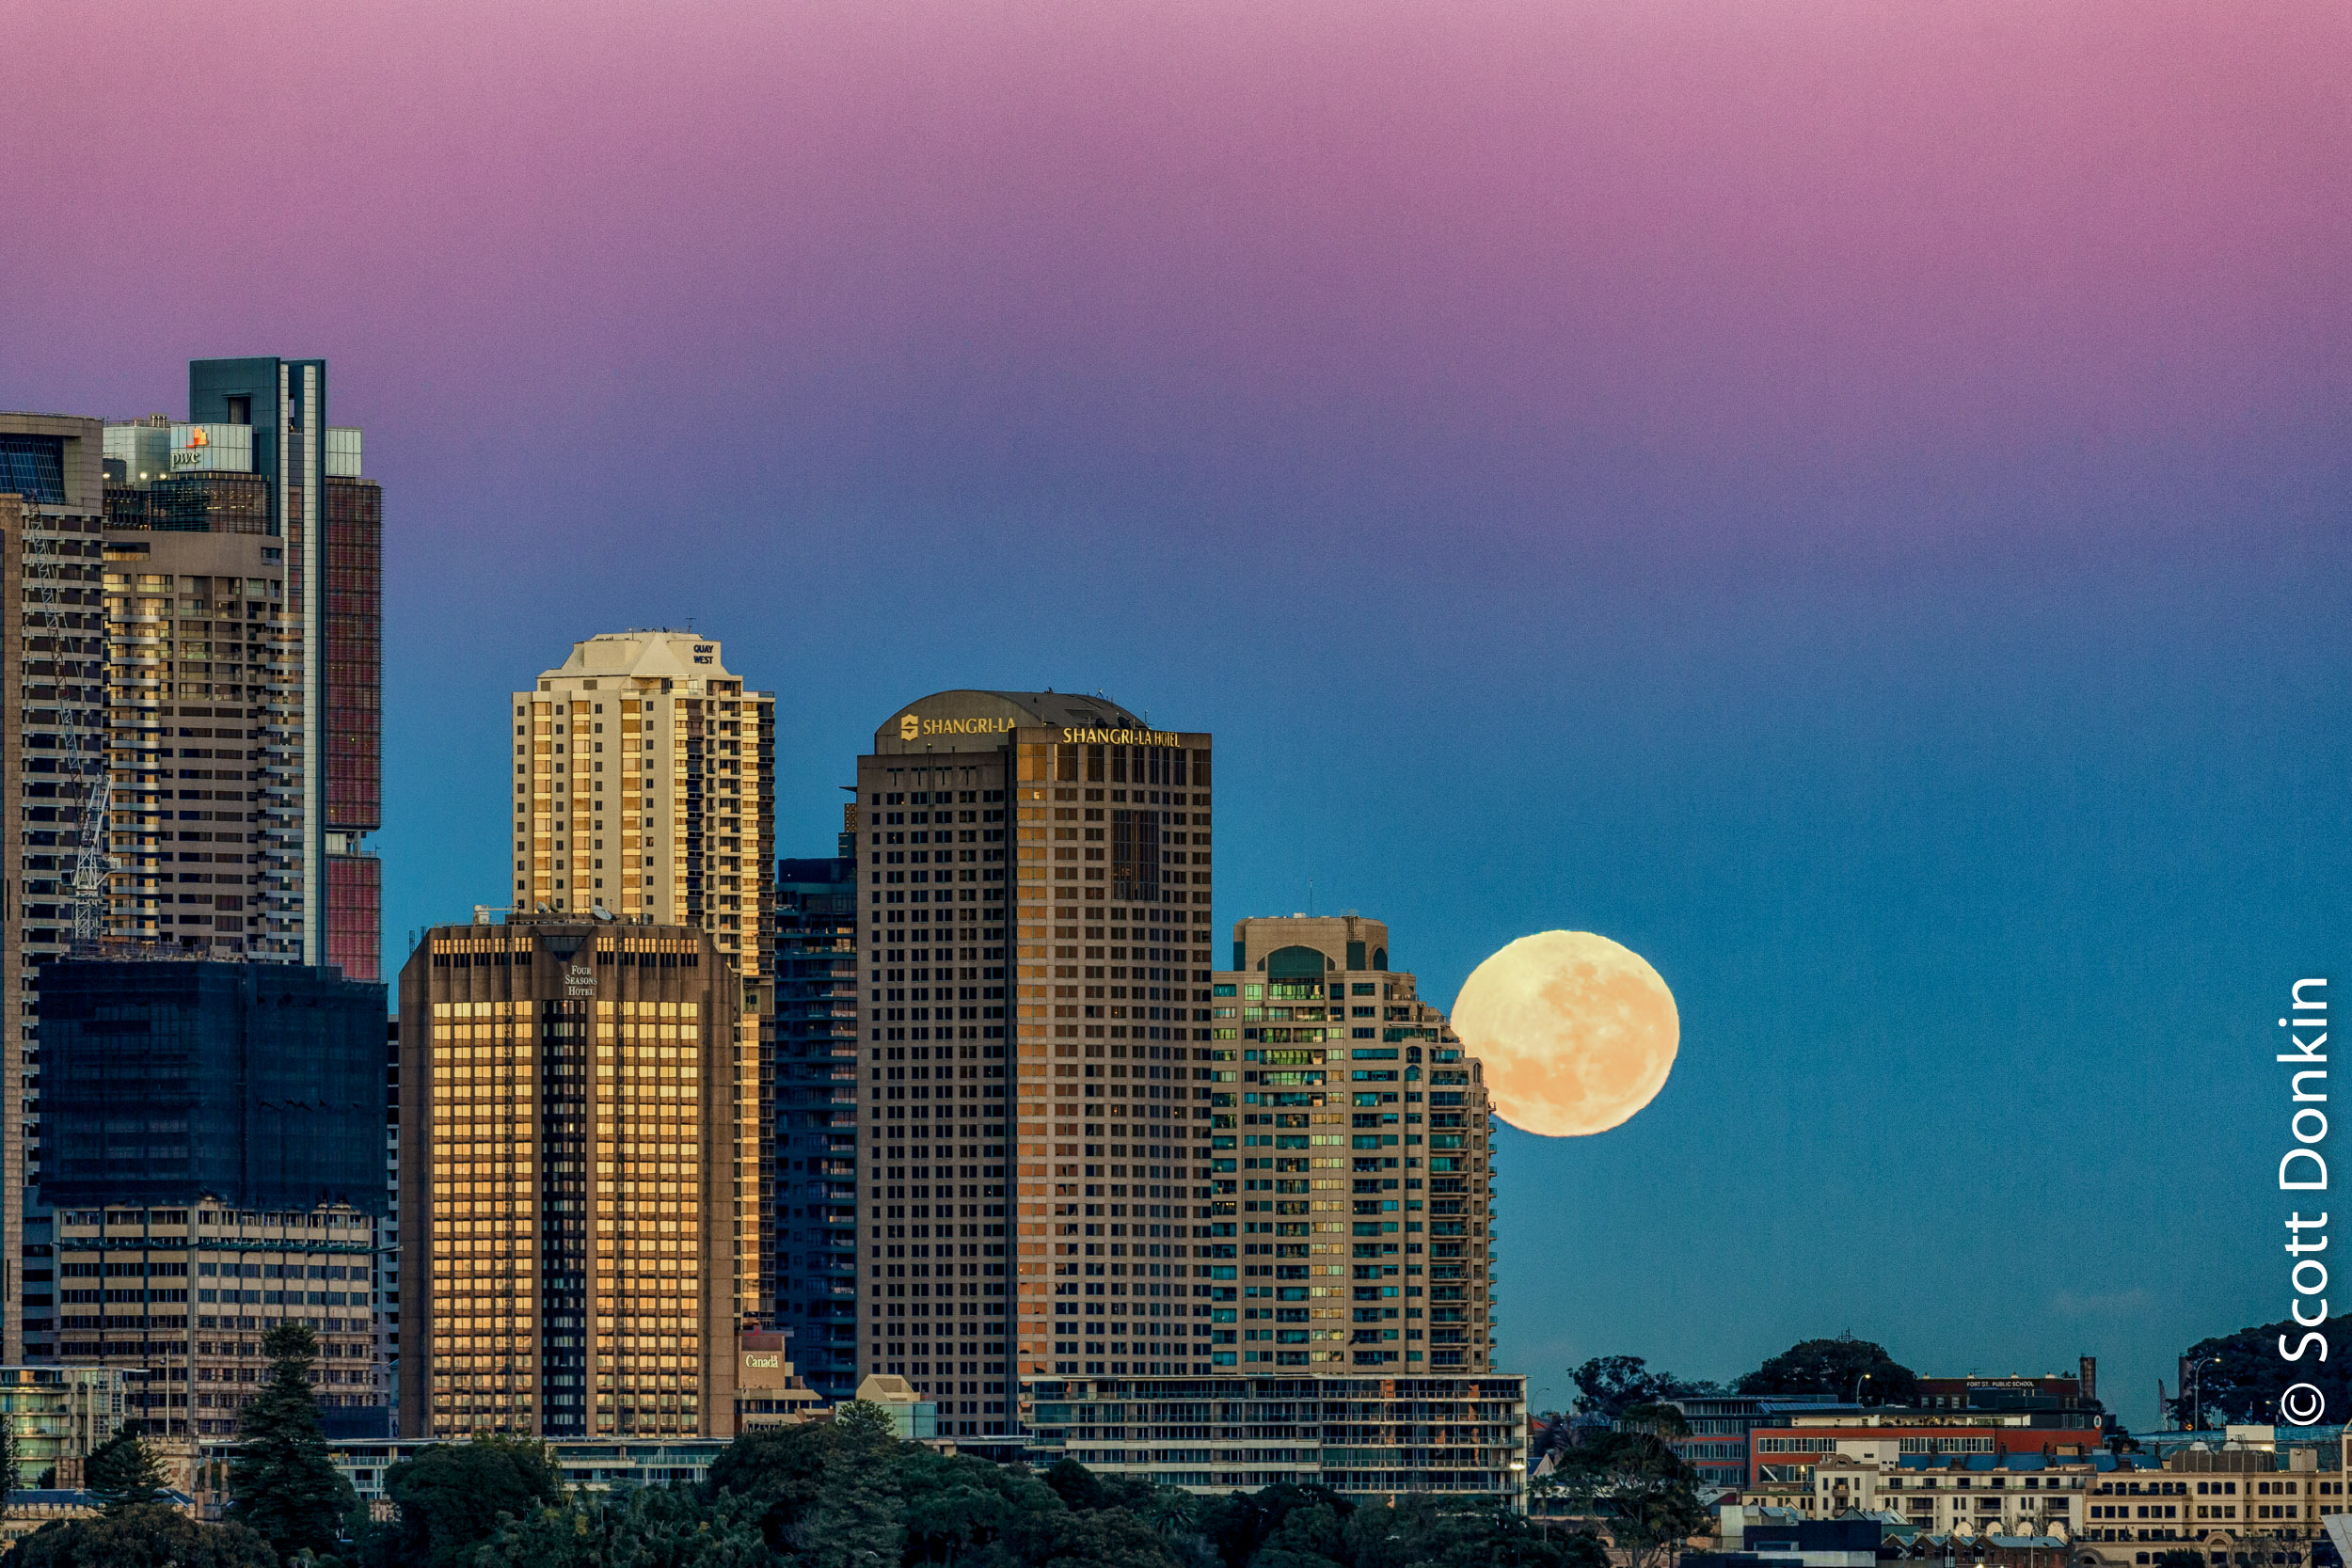 Moonset at dawn. Sydney skyline. 8 August 2017.